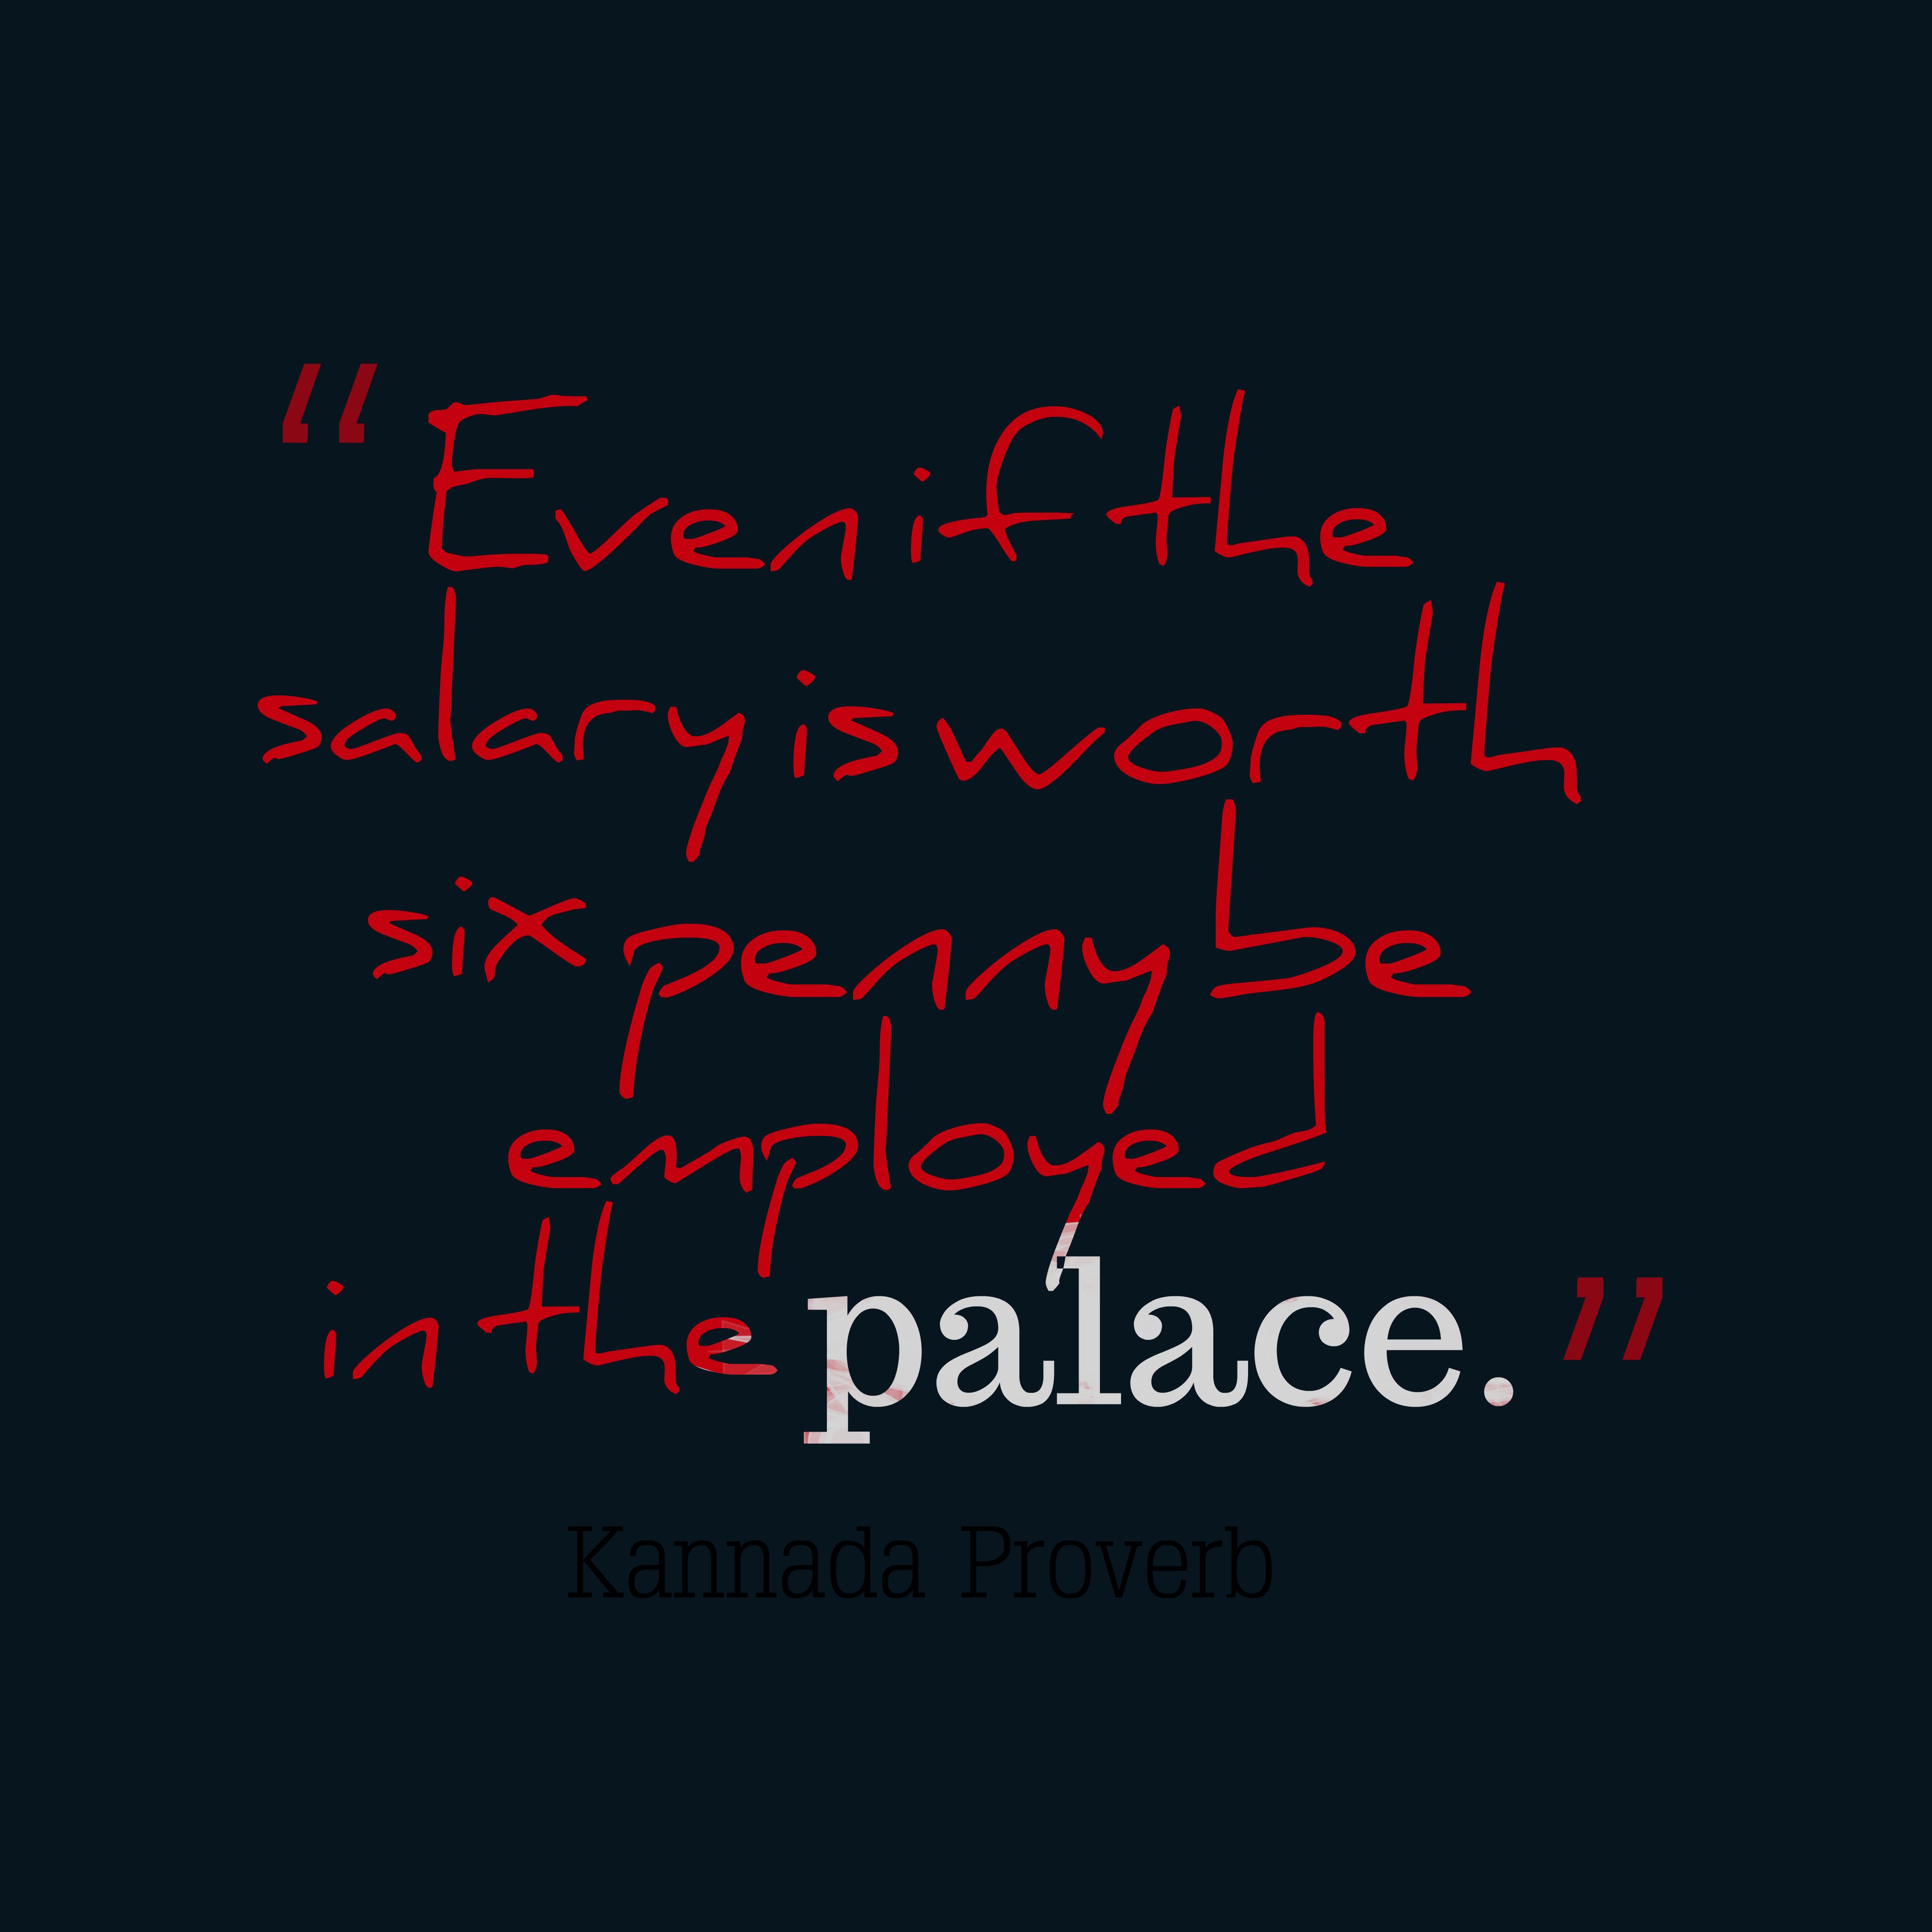 kannada proverb about job